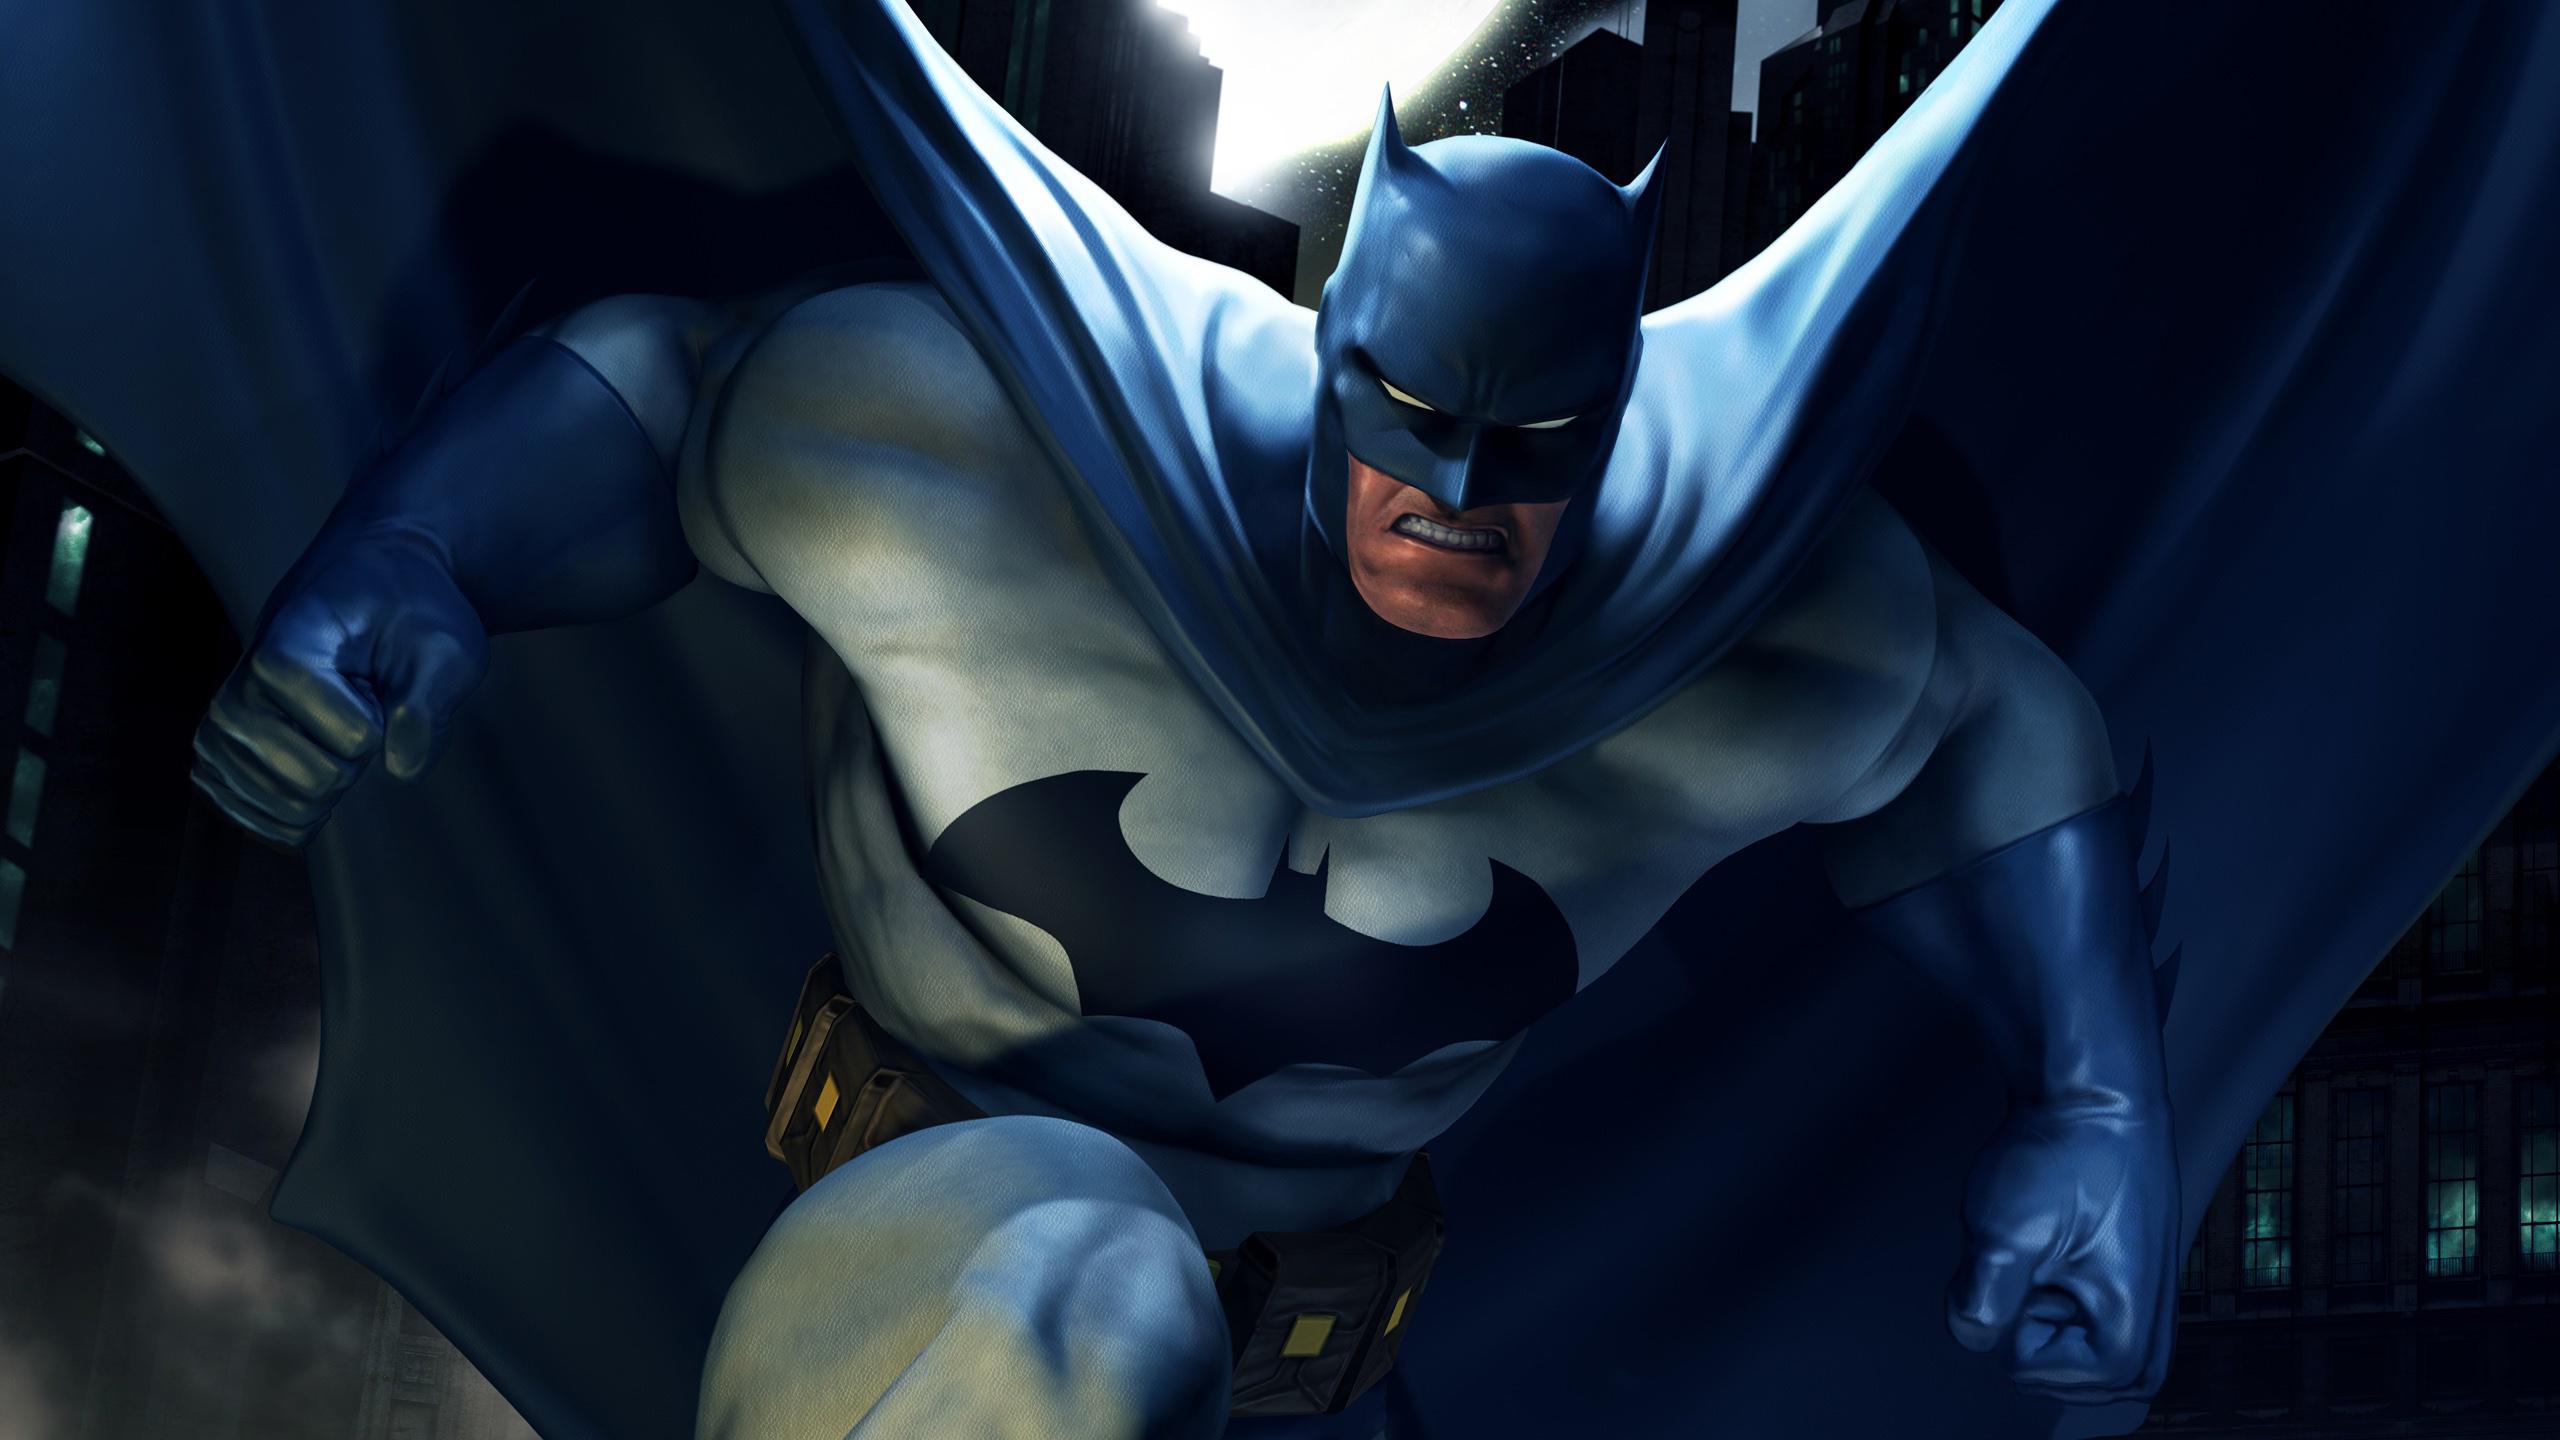 HDoboi.Kiev.ua - Бэтмен арт обои, кино заставки, мульфильм, Batman, dc universe